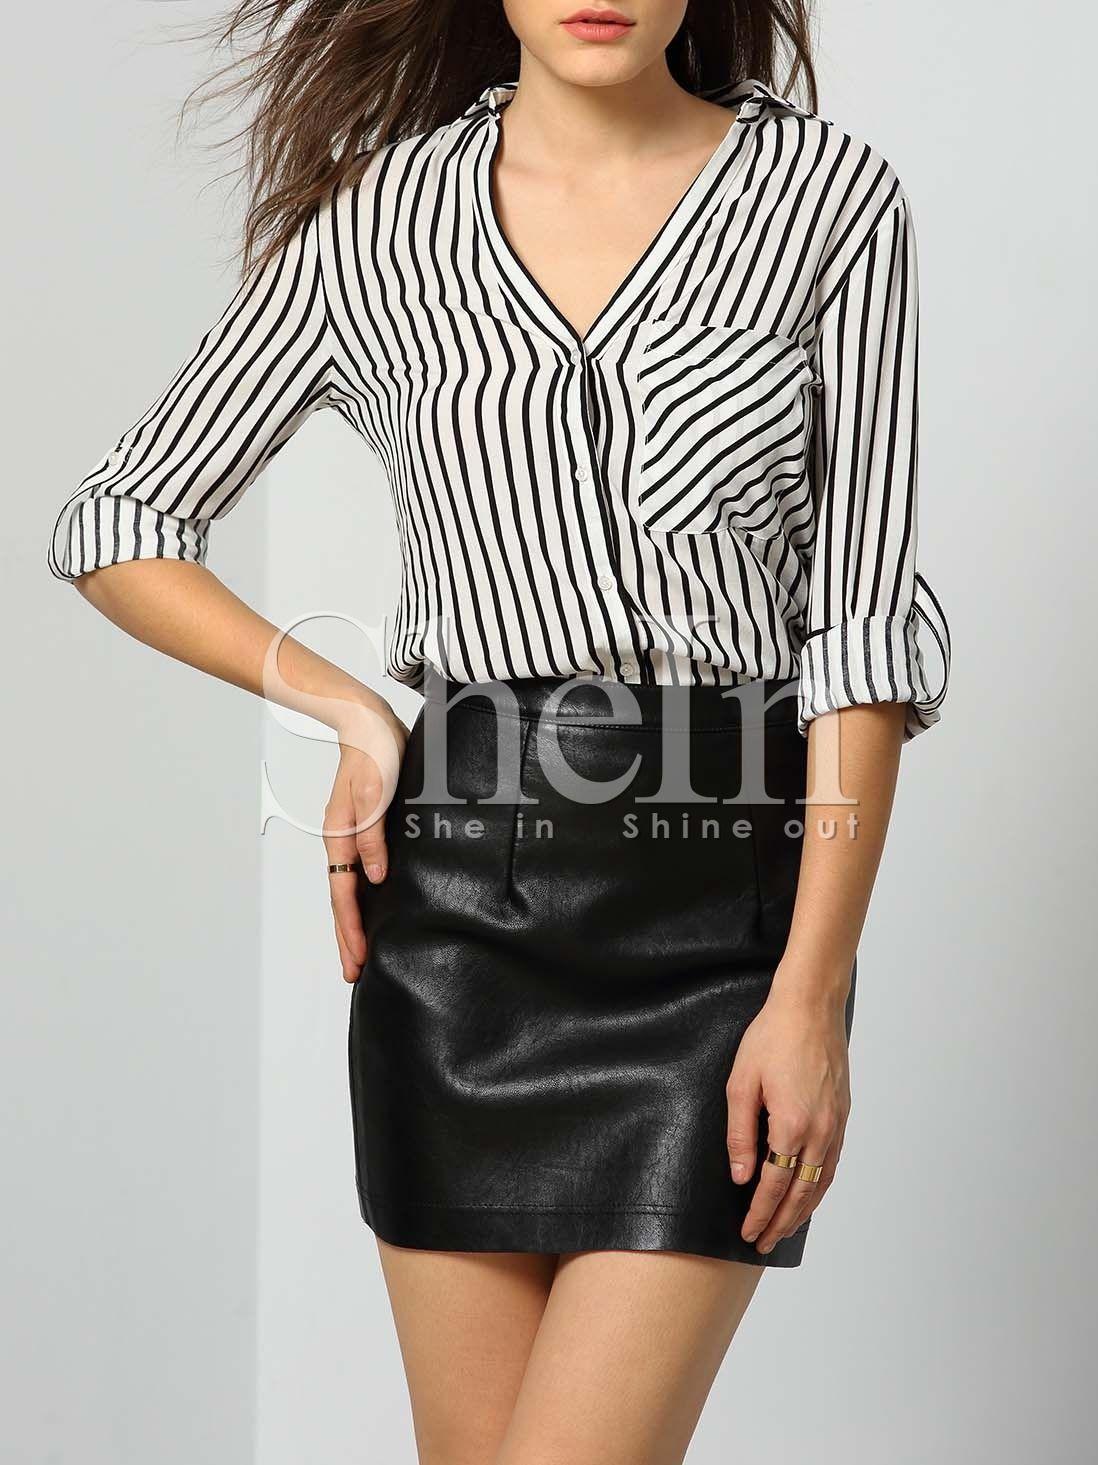 Blusa solapa rayas verticales bolsillos-(Sheinside)